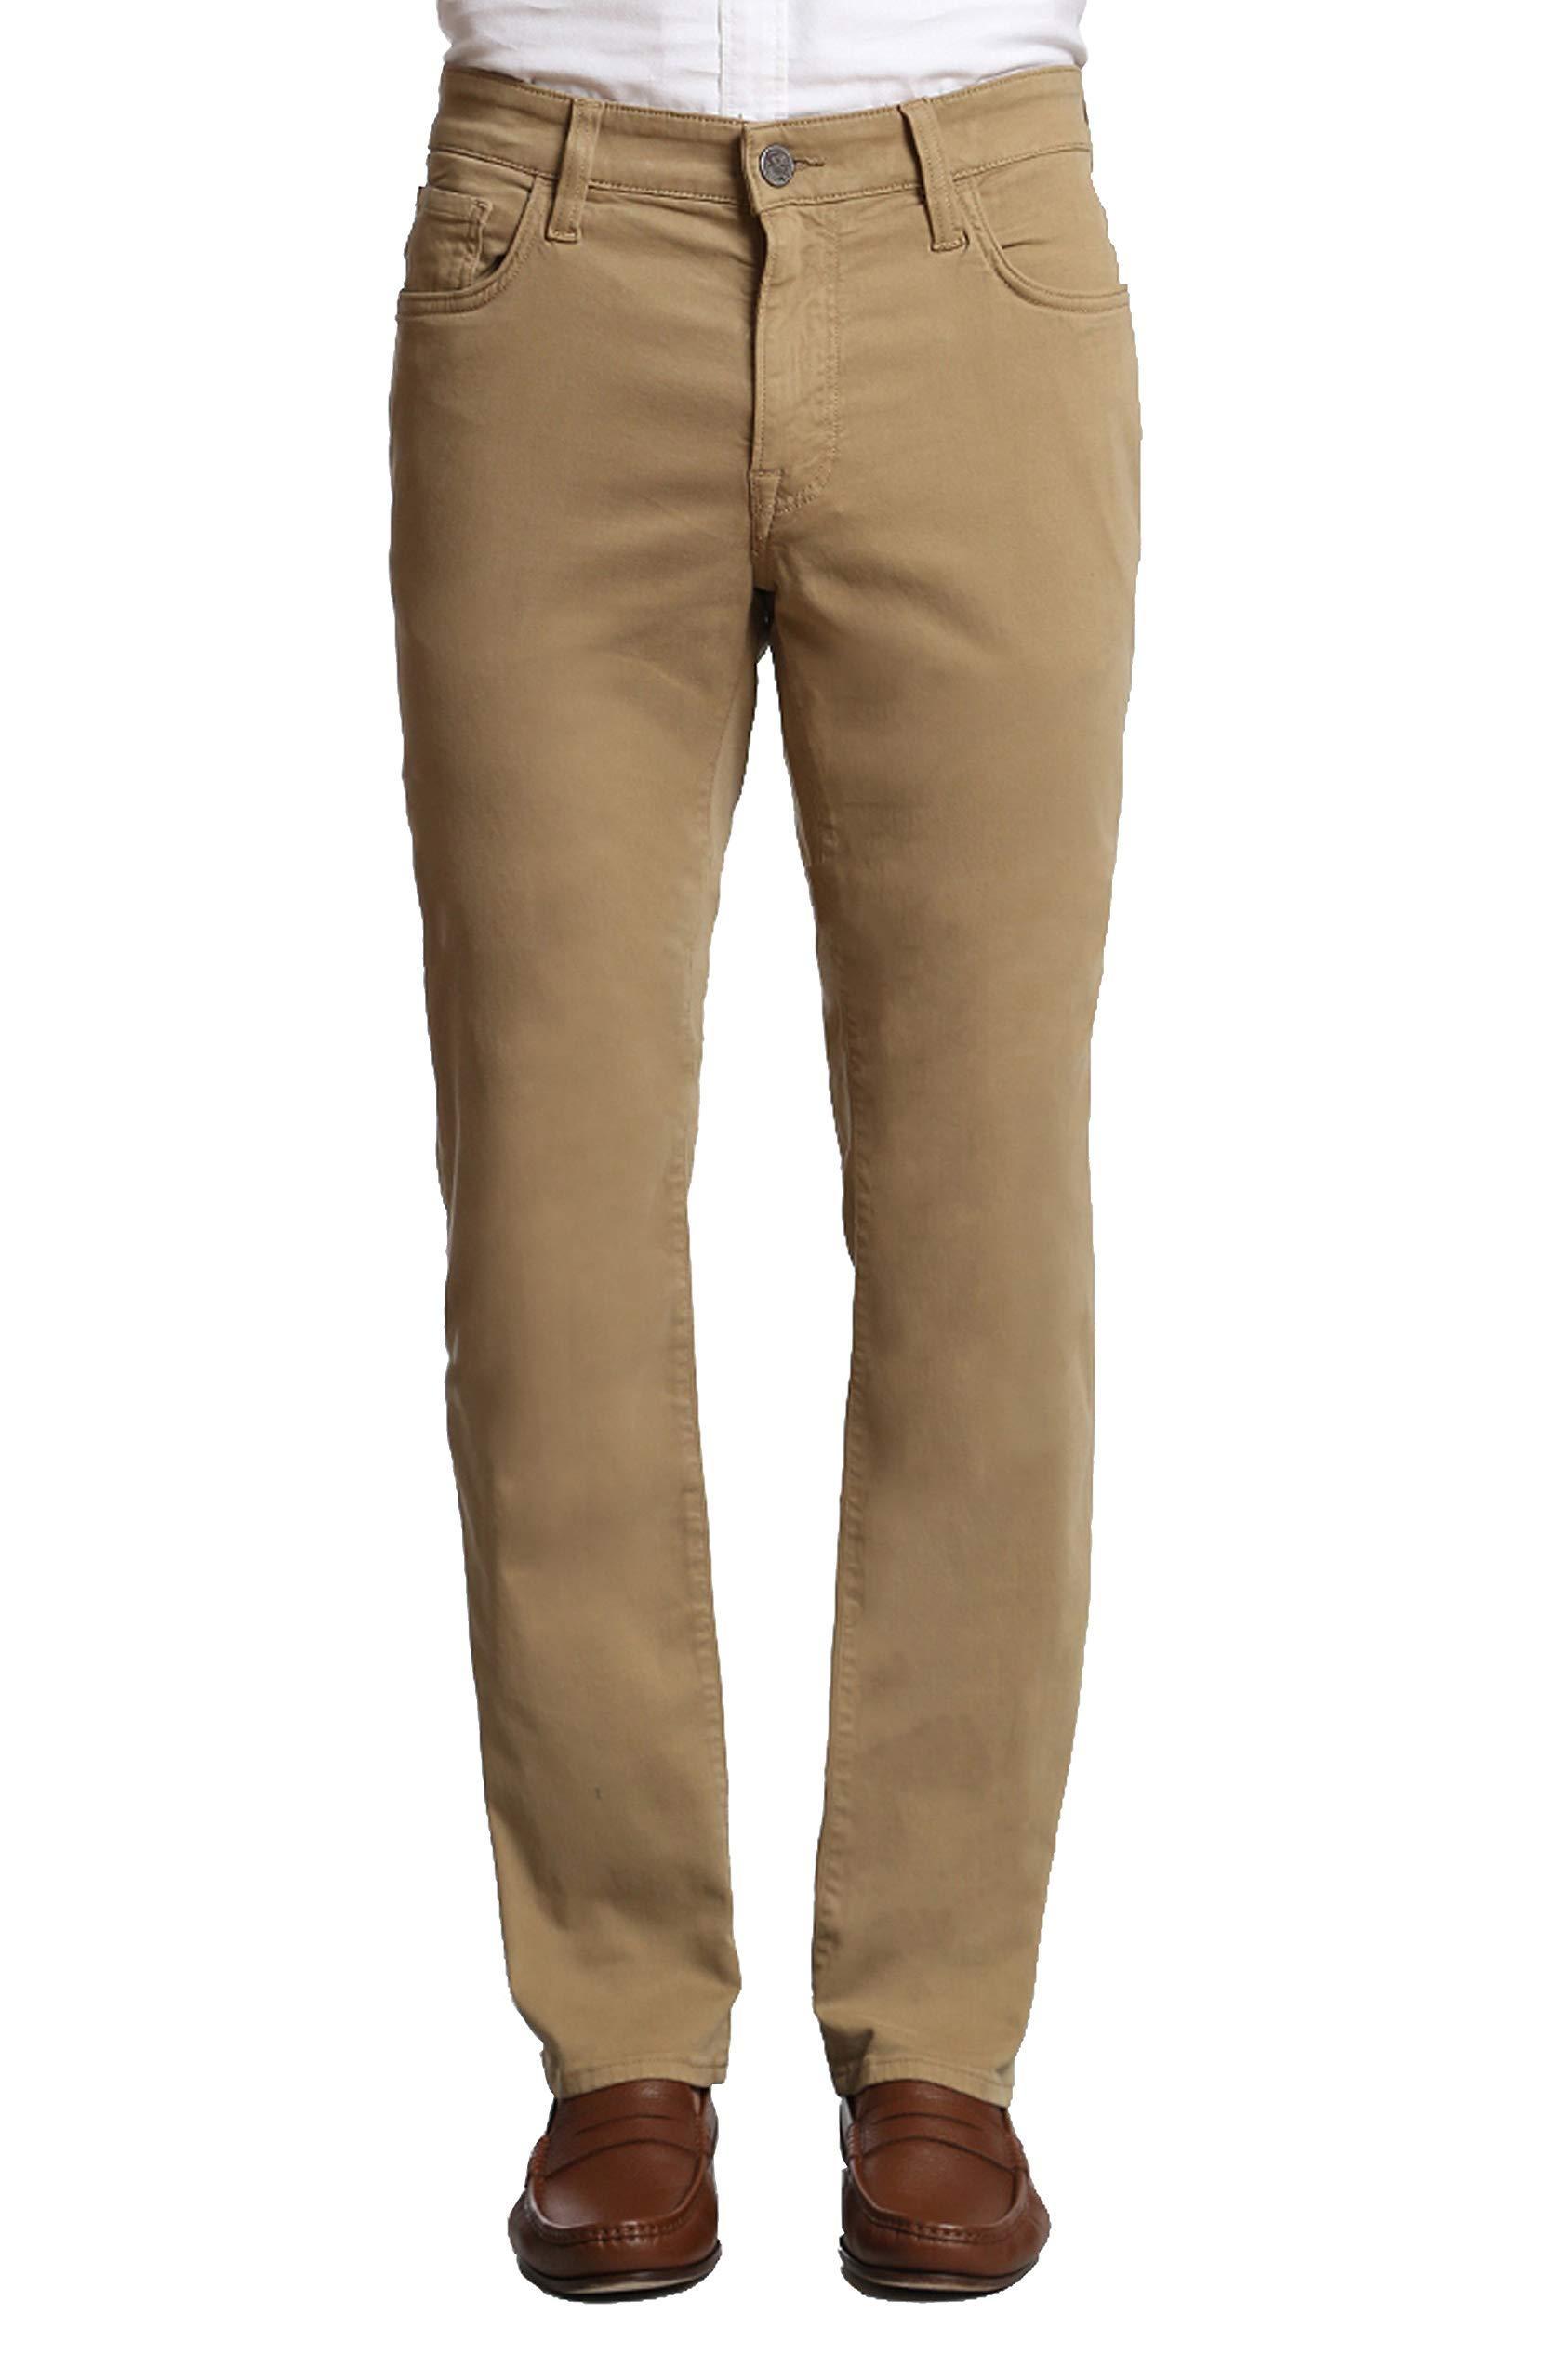 34 Heritage Men's Courage Straight Pants, Khaki Twill 36 x 30